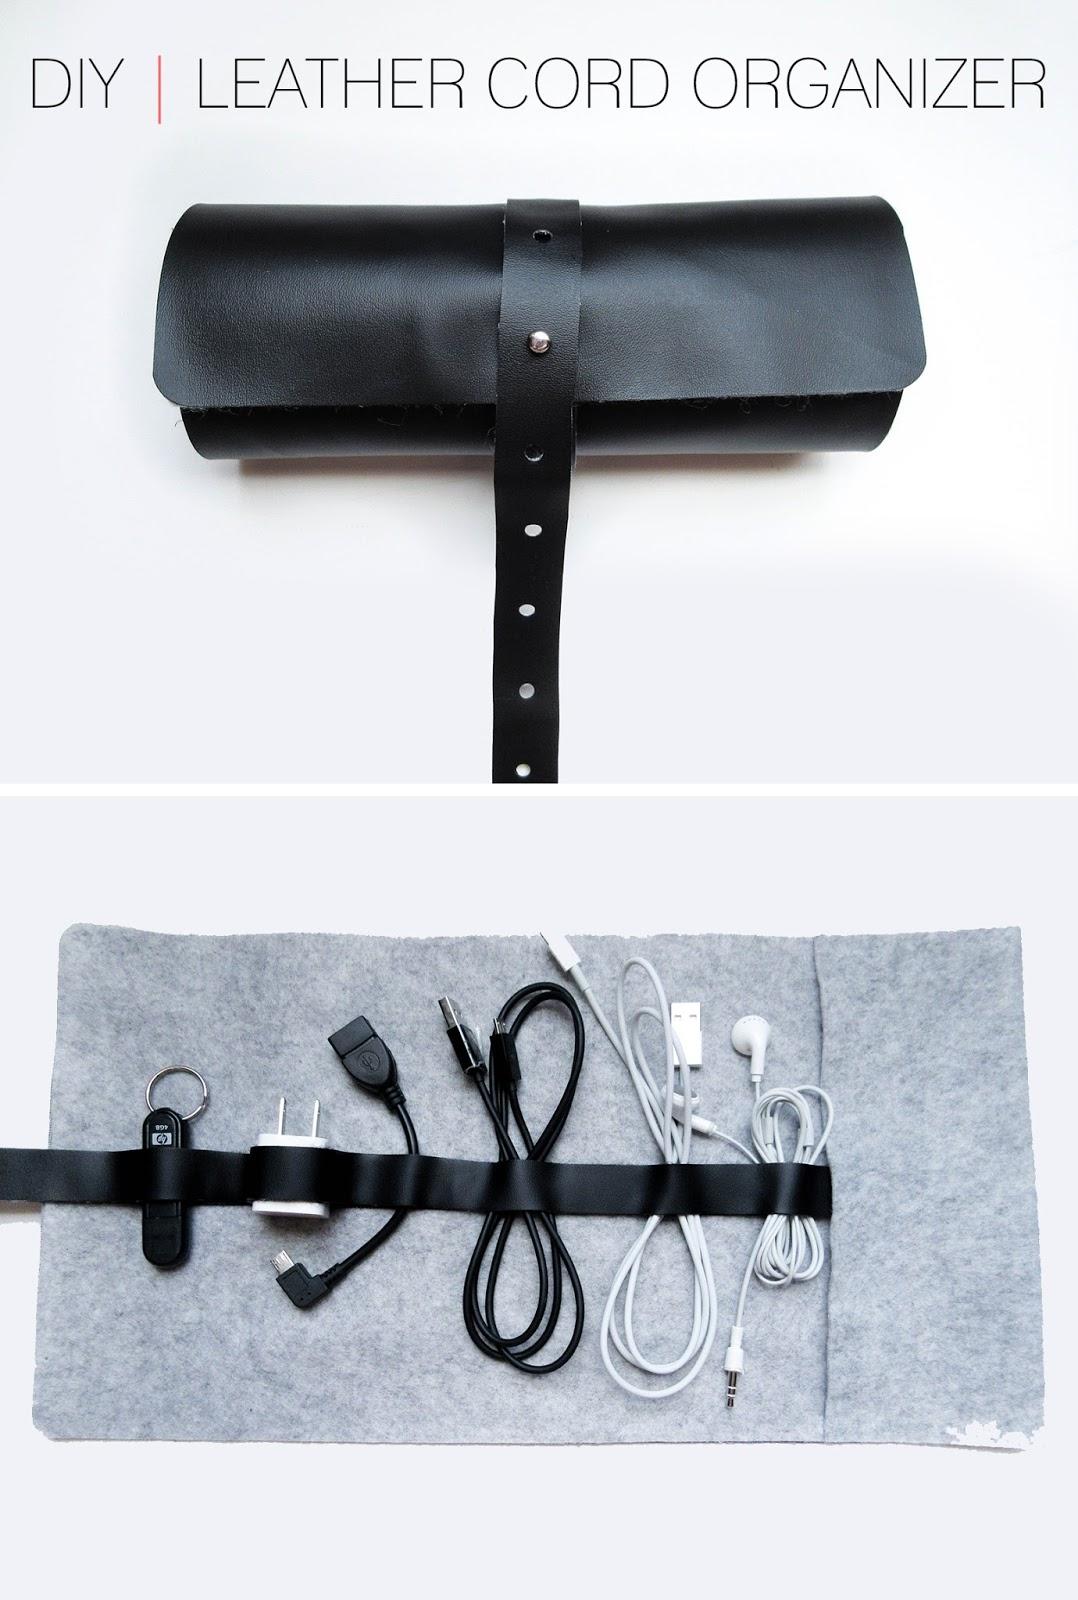 cafe craftea diy leather cord organizer. Black Bedroom Furniture Sets. Home Design Ideas